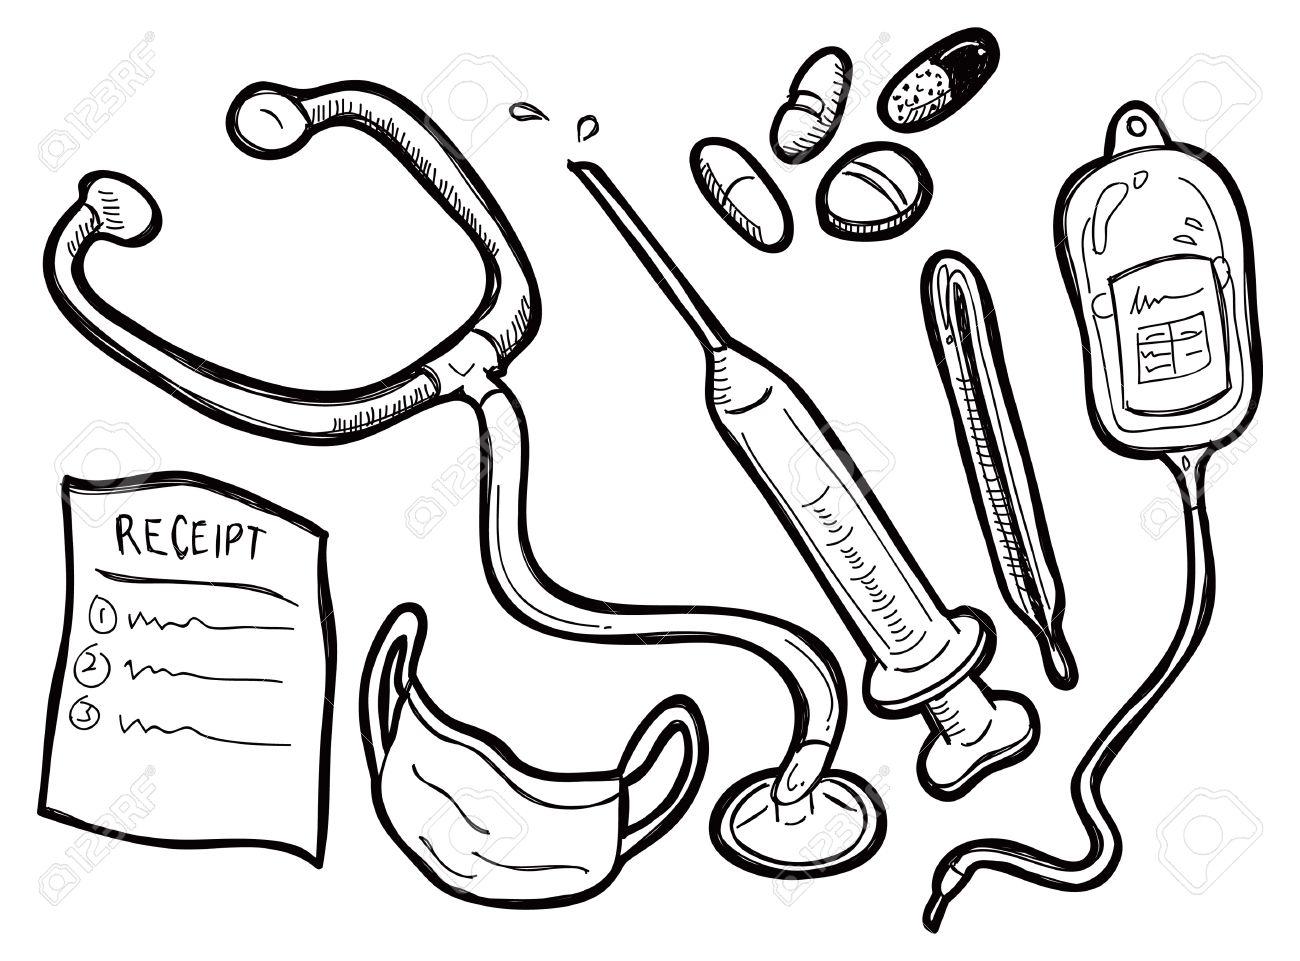 Medical Equipment Drawing At Getdrawings